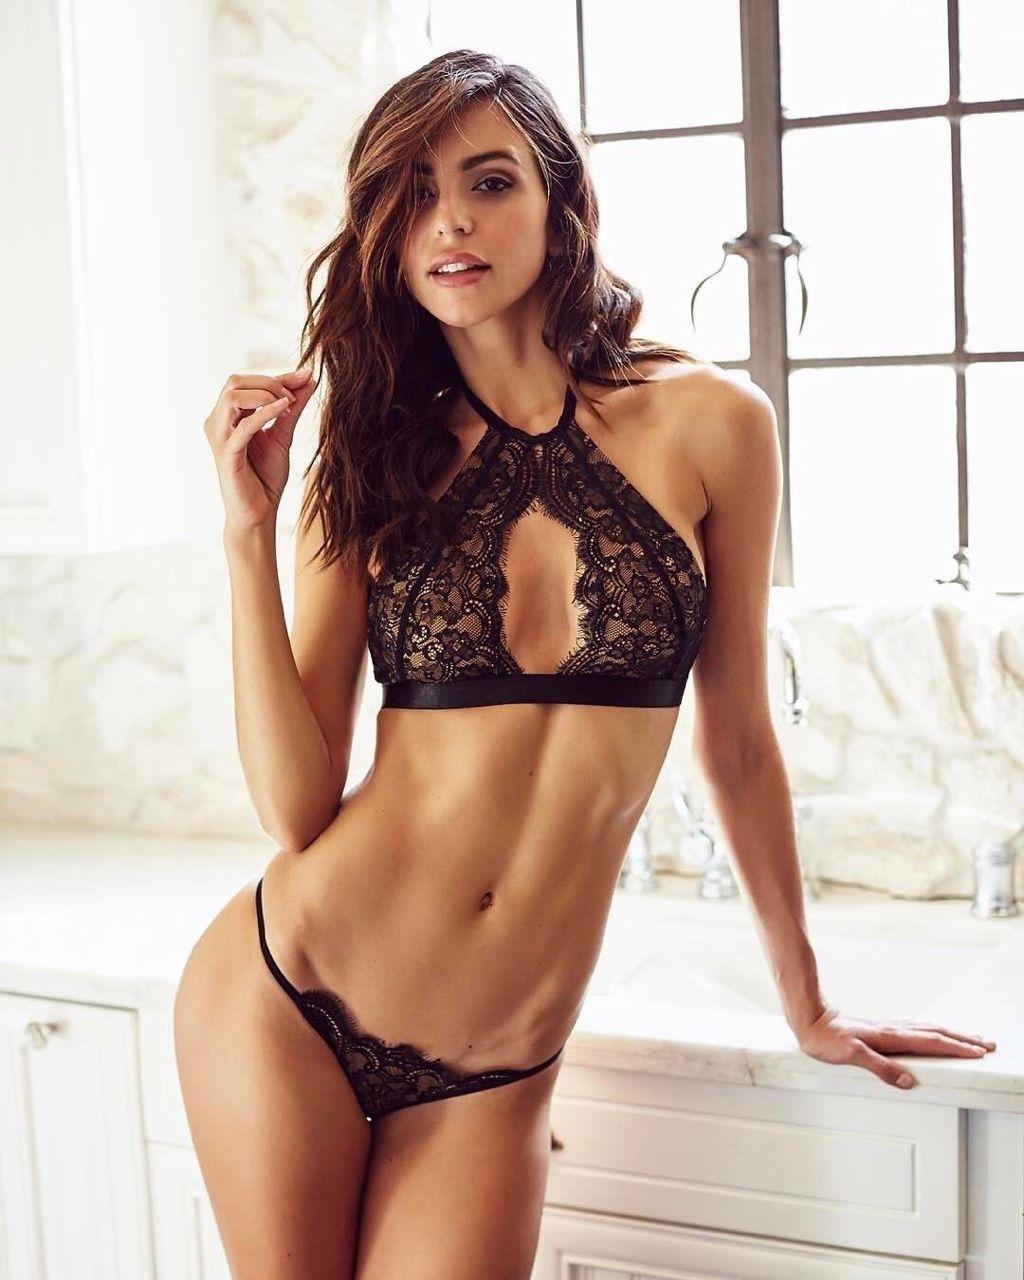 Pictures Amanda Marie Pizziconi naked (31 photos), Ass, Bikini, Twitter, butt 2017